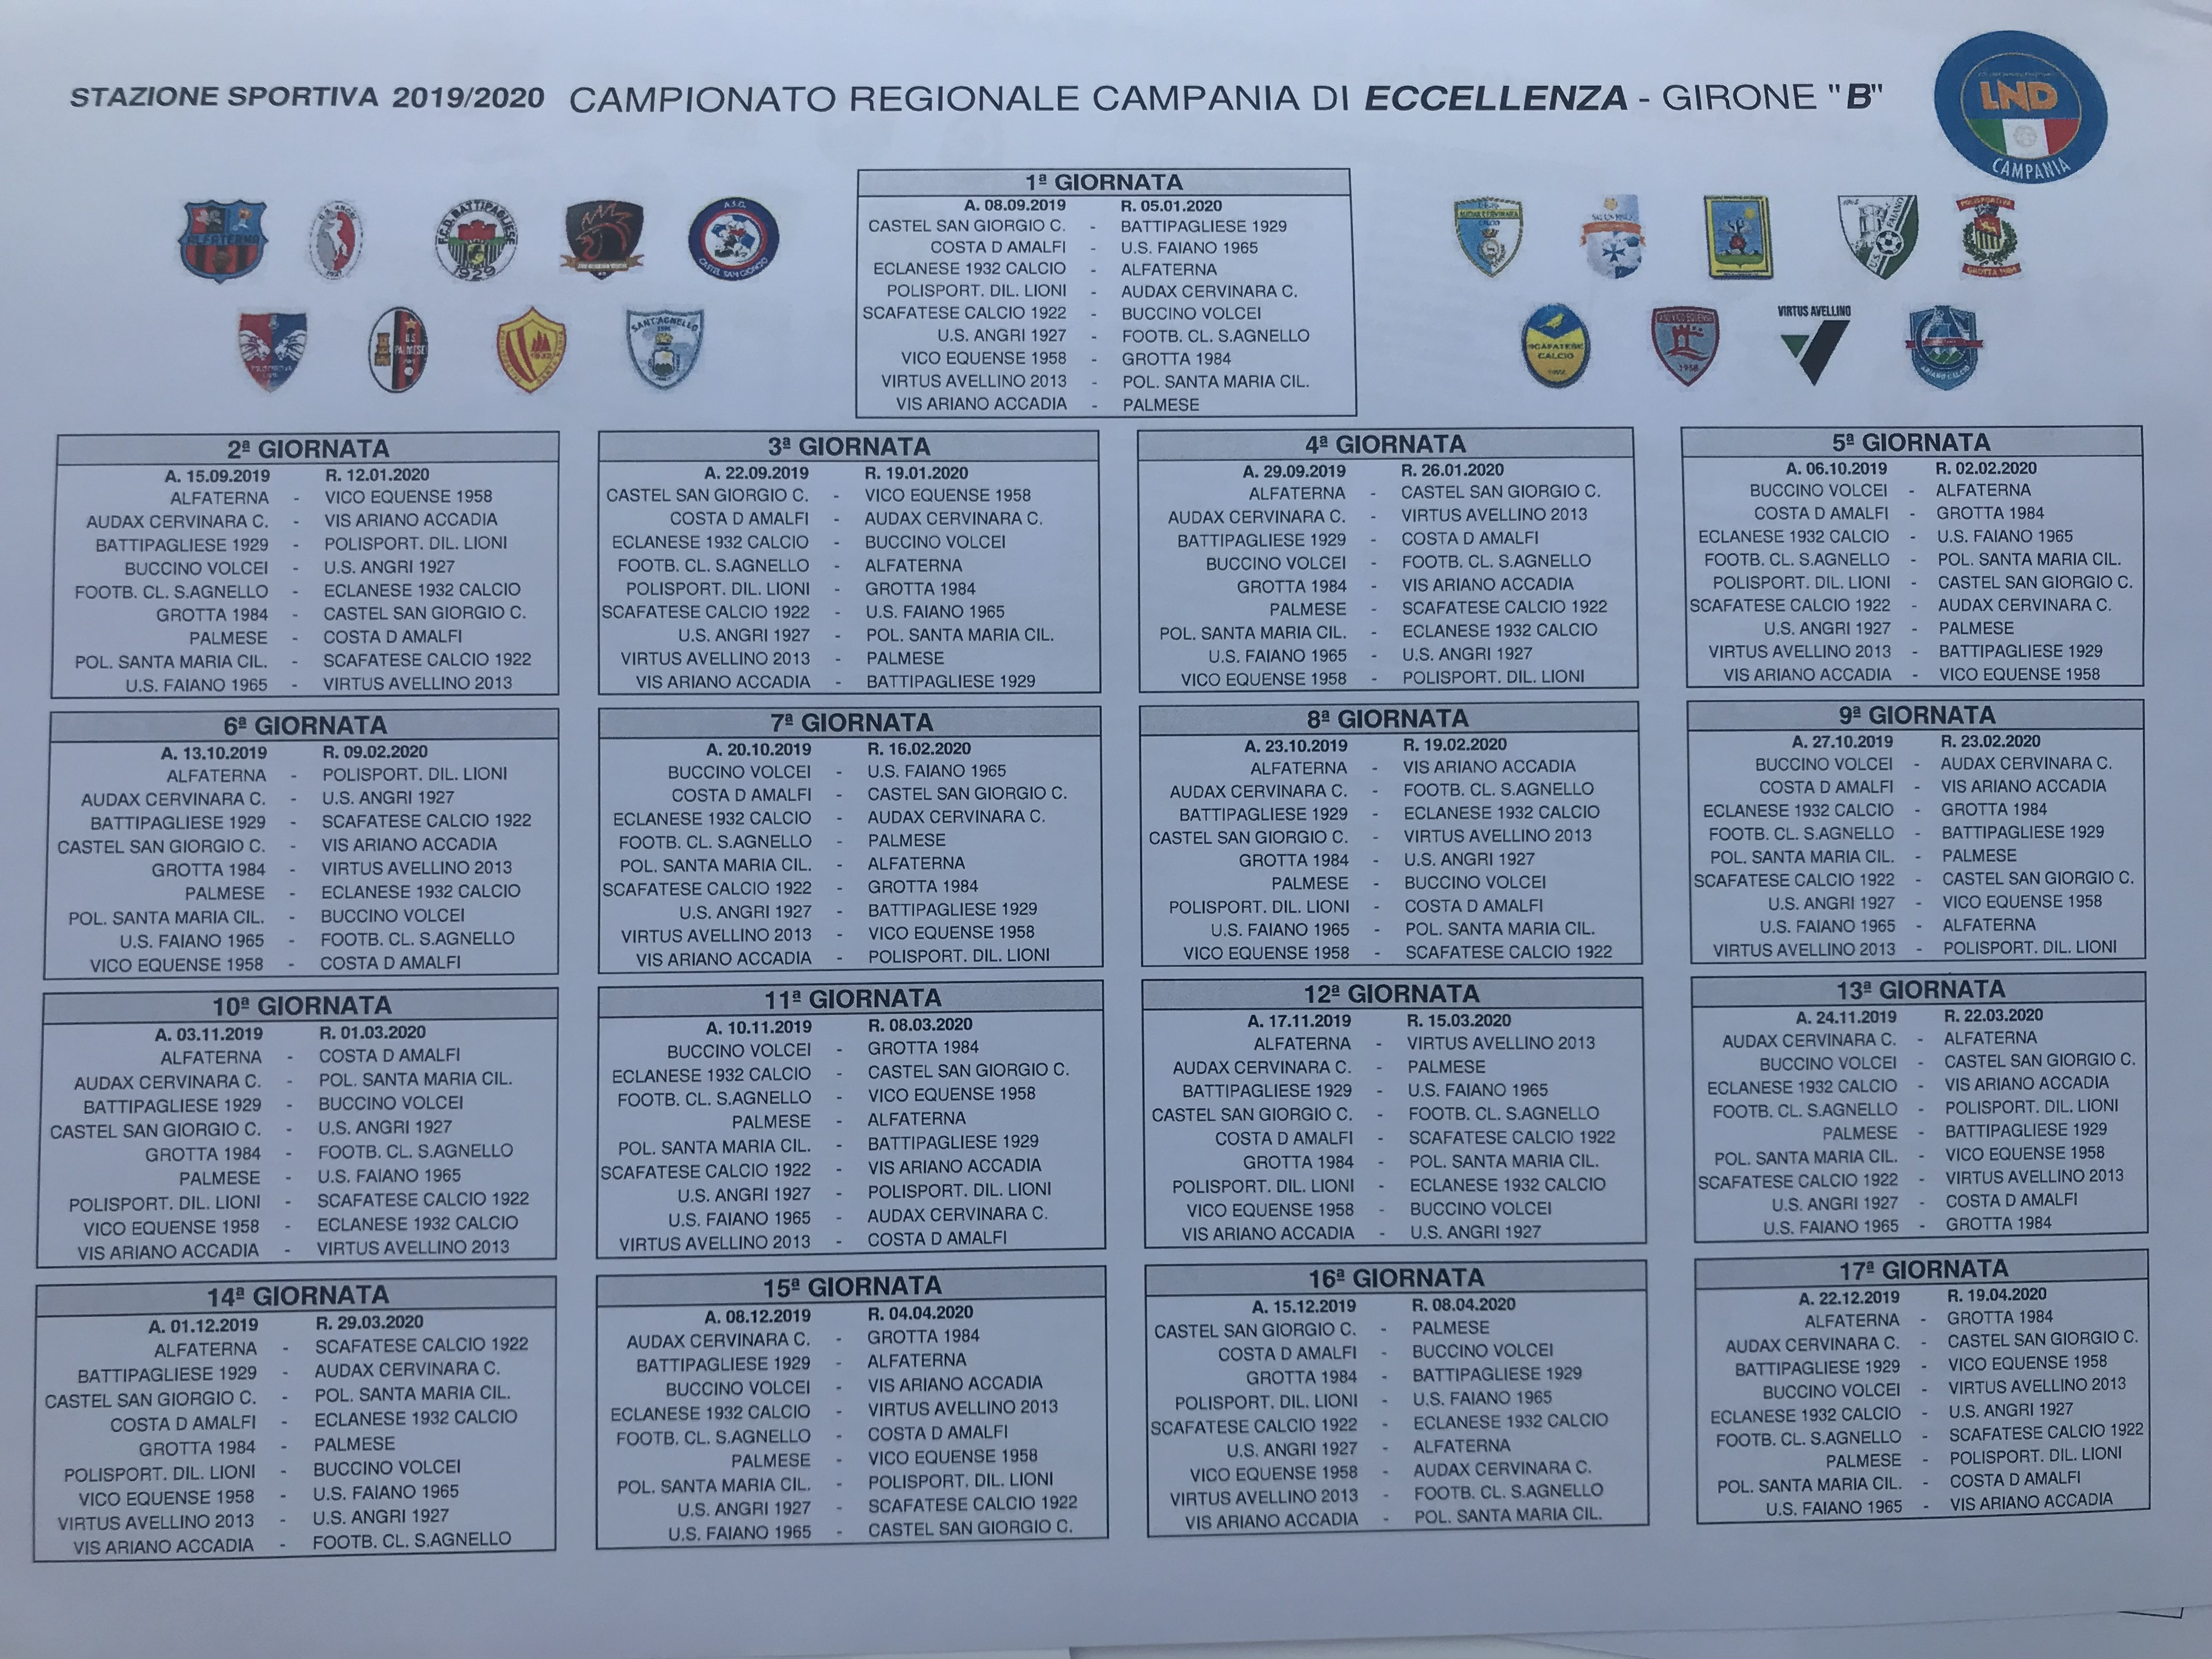 Calendario Eccellenza Girone B.Eccellenza Girone B 2019 20 Guarda Il Calendario Completo